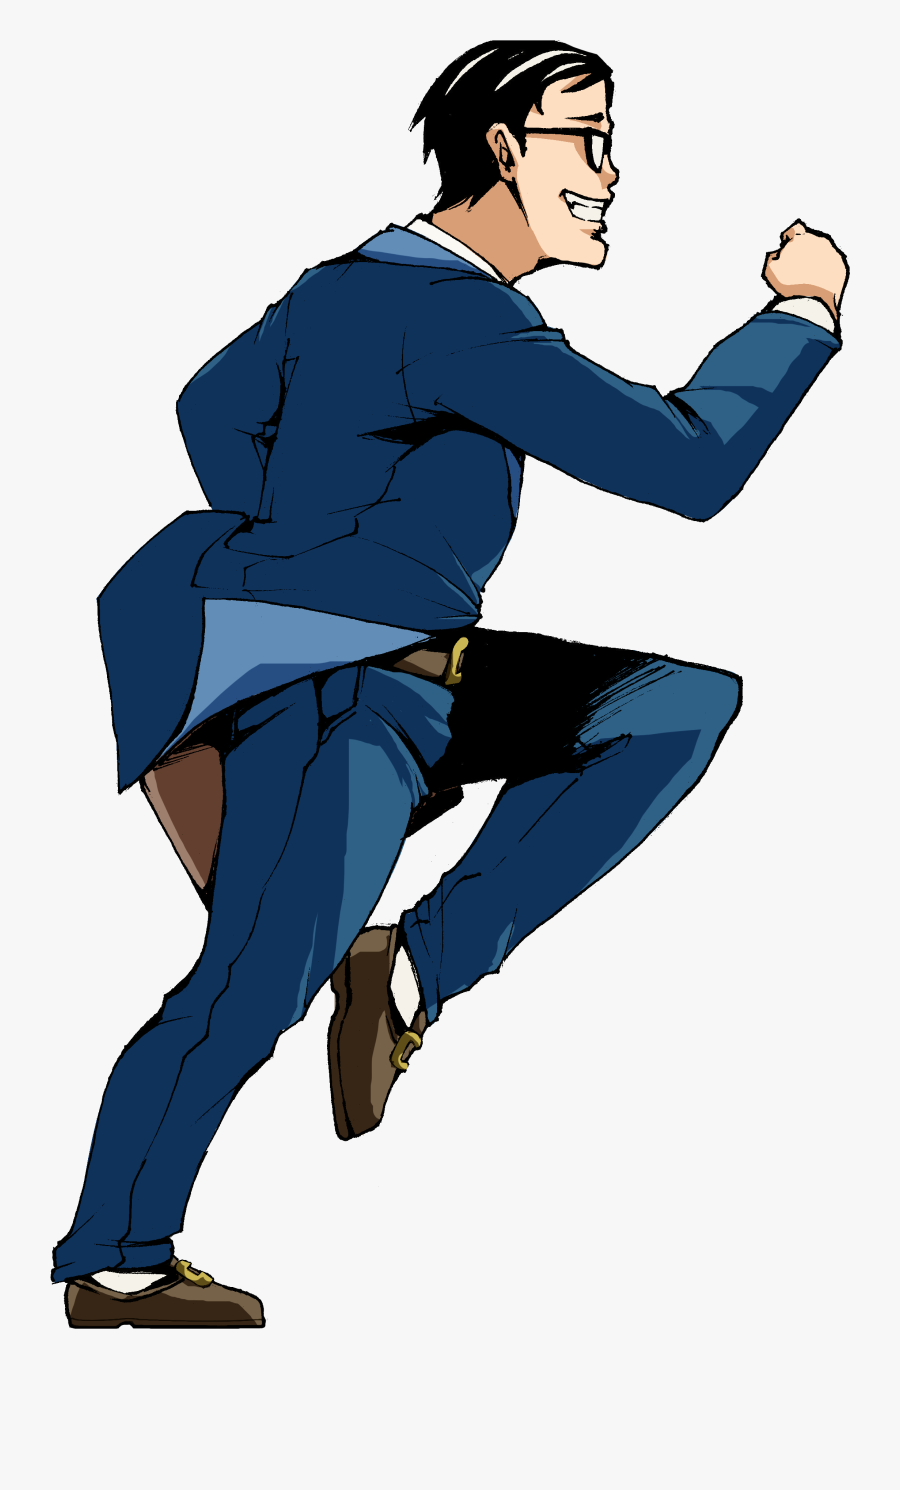 Joannime07elric Running Man In Suit 2 By Joannime07elric - Cartoon Man In Suit Running, Transparent Clipart